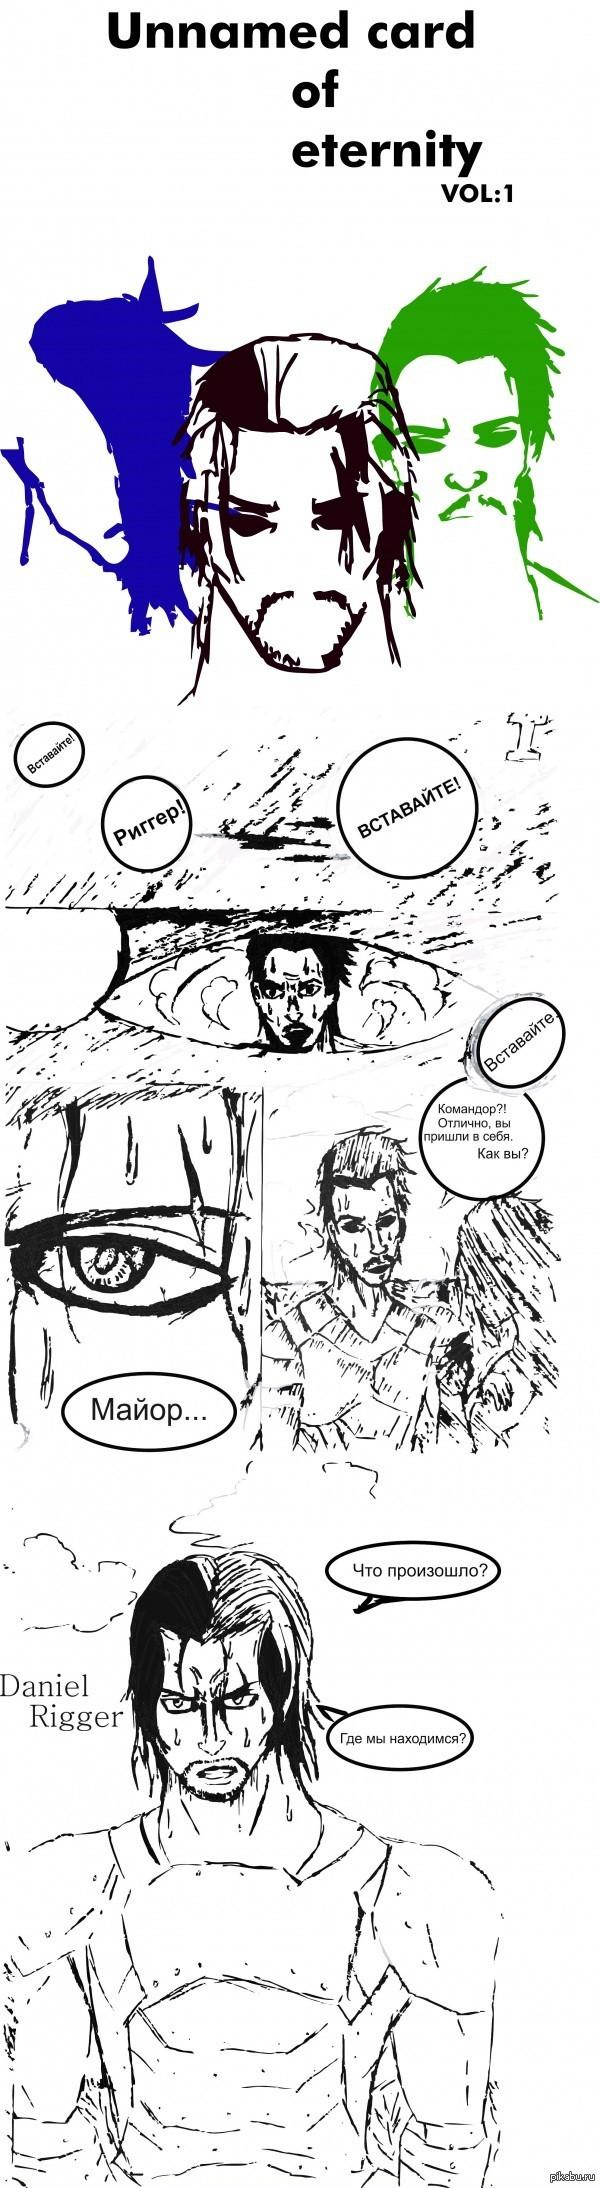 Комикс. Сценарий- мое, Рисовка- Олег там выложена работа http://acomics.ru/~UCoE